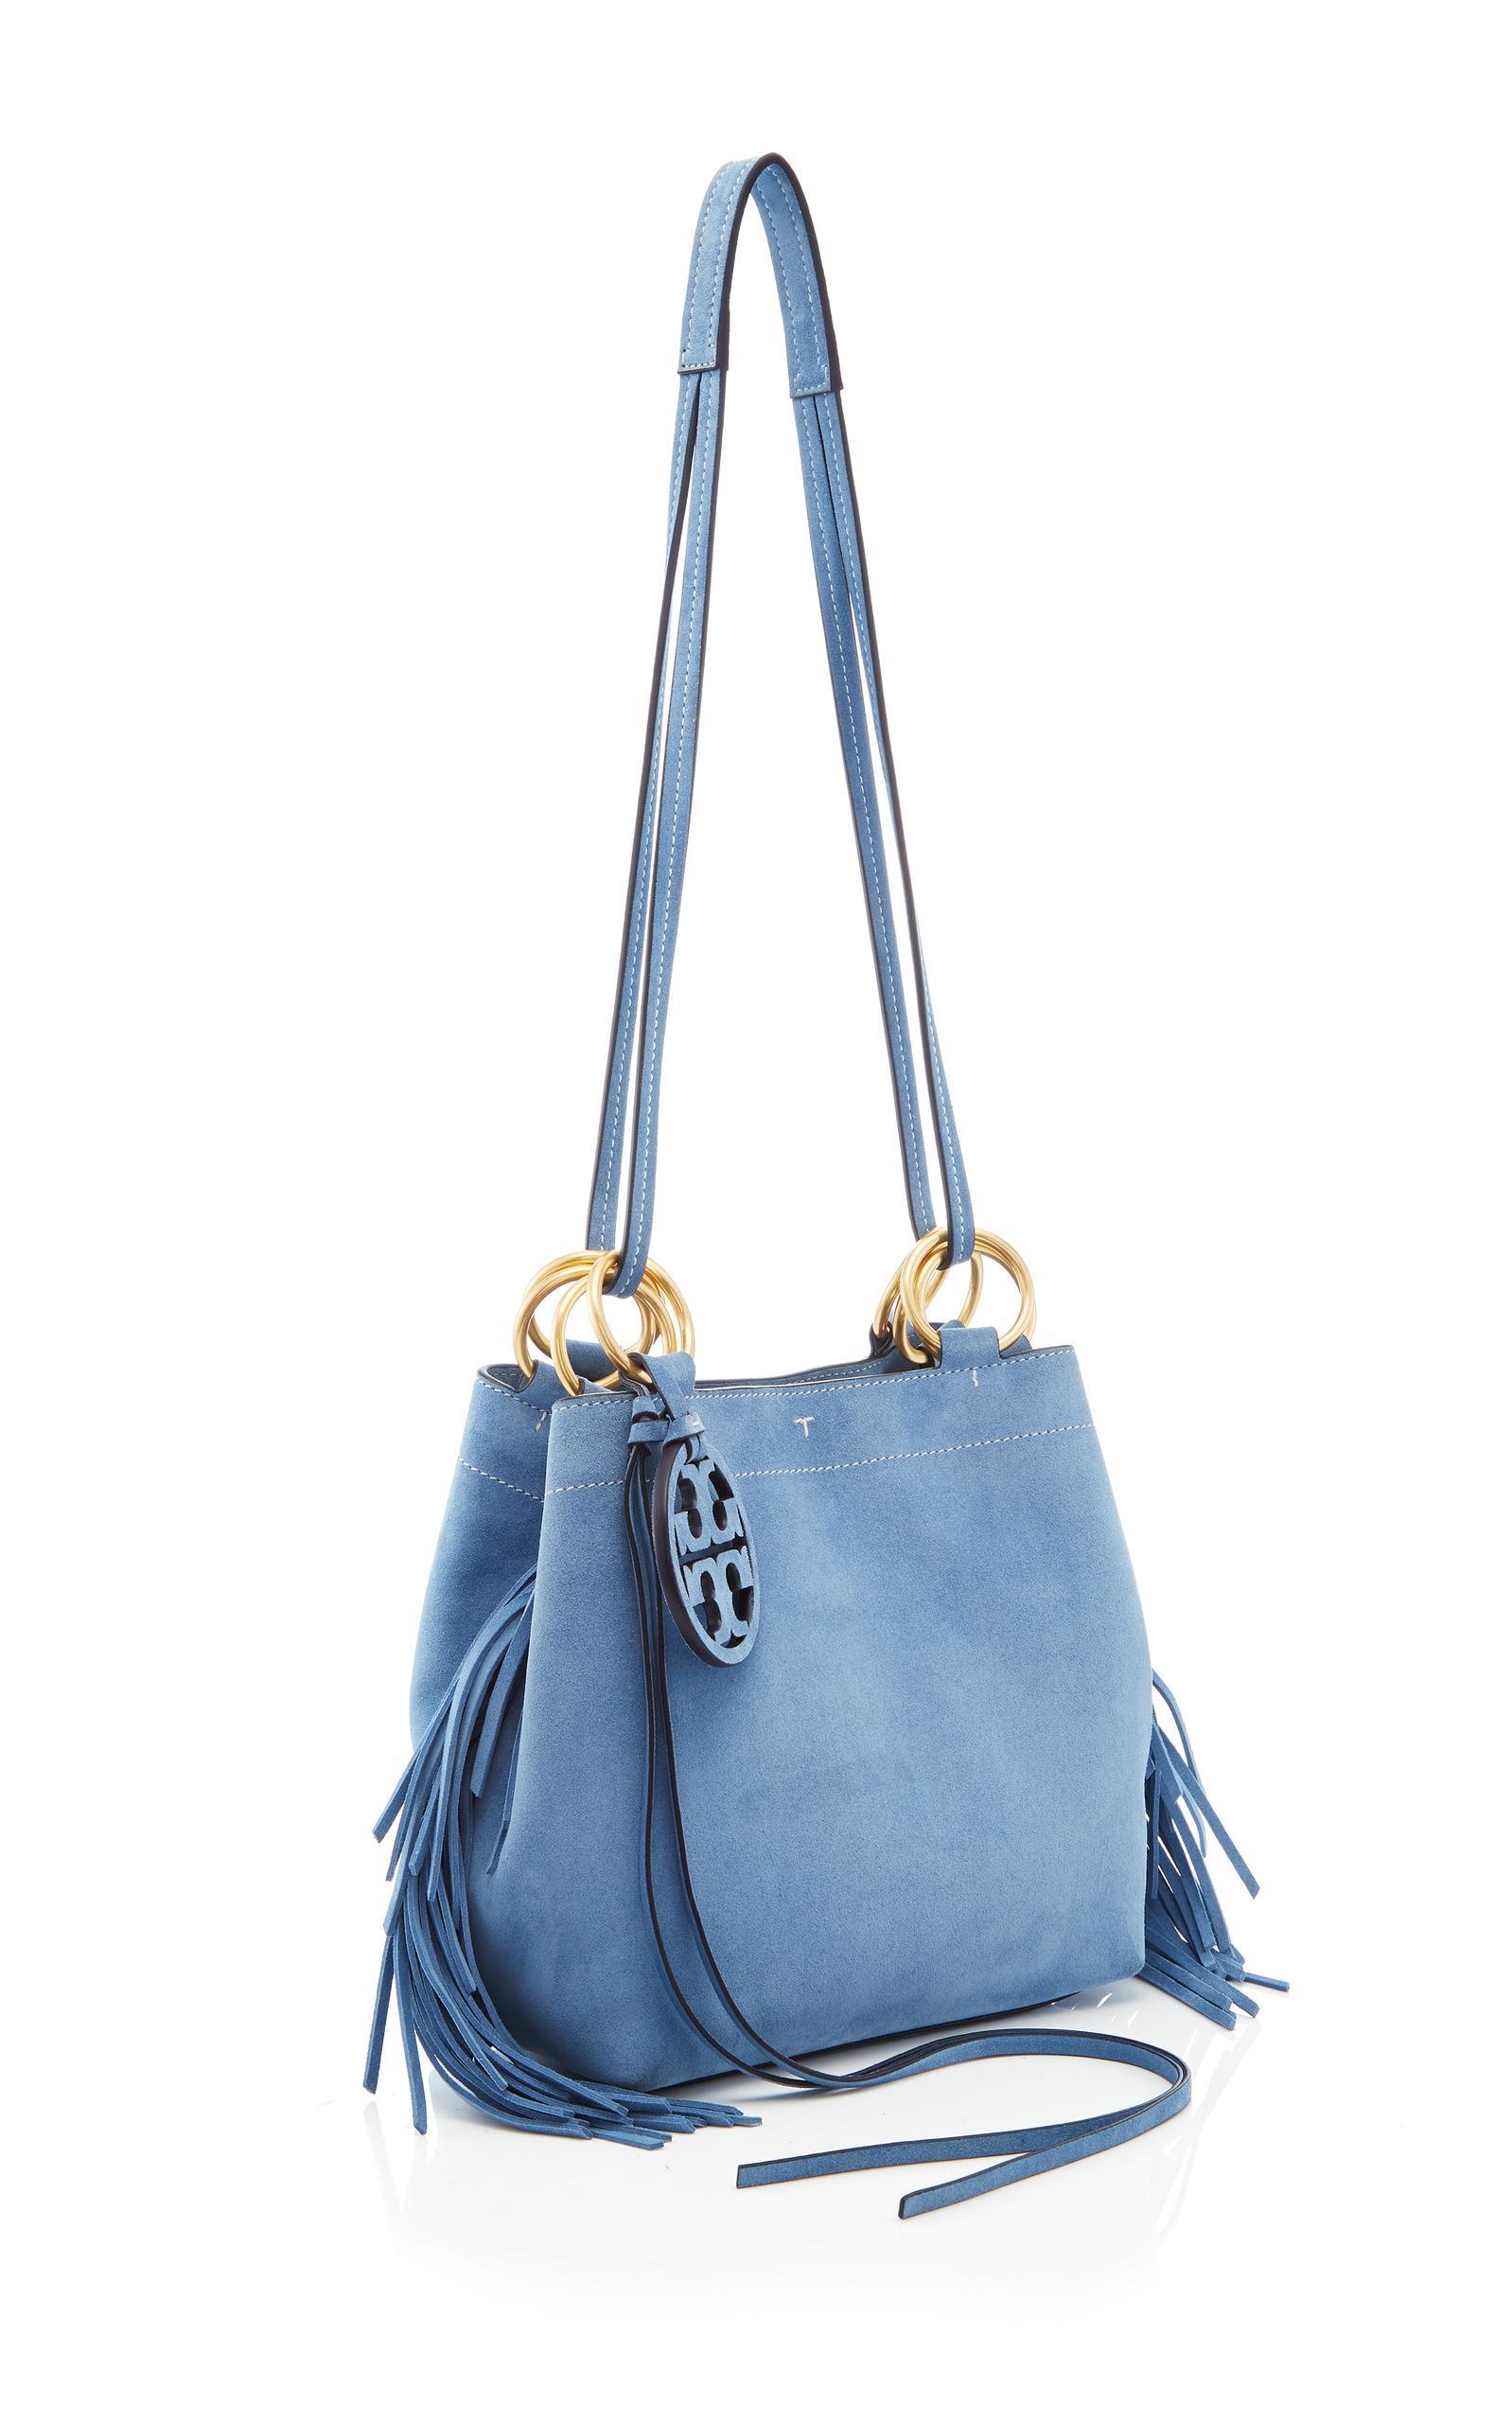 559460f21bb5 Lyst - Tory Burch Farrah Fringe Mini Tote in Blue